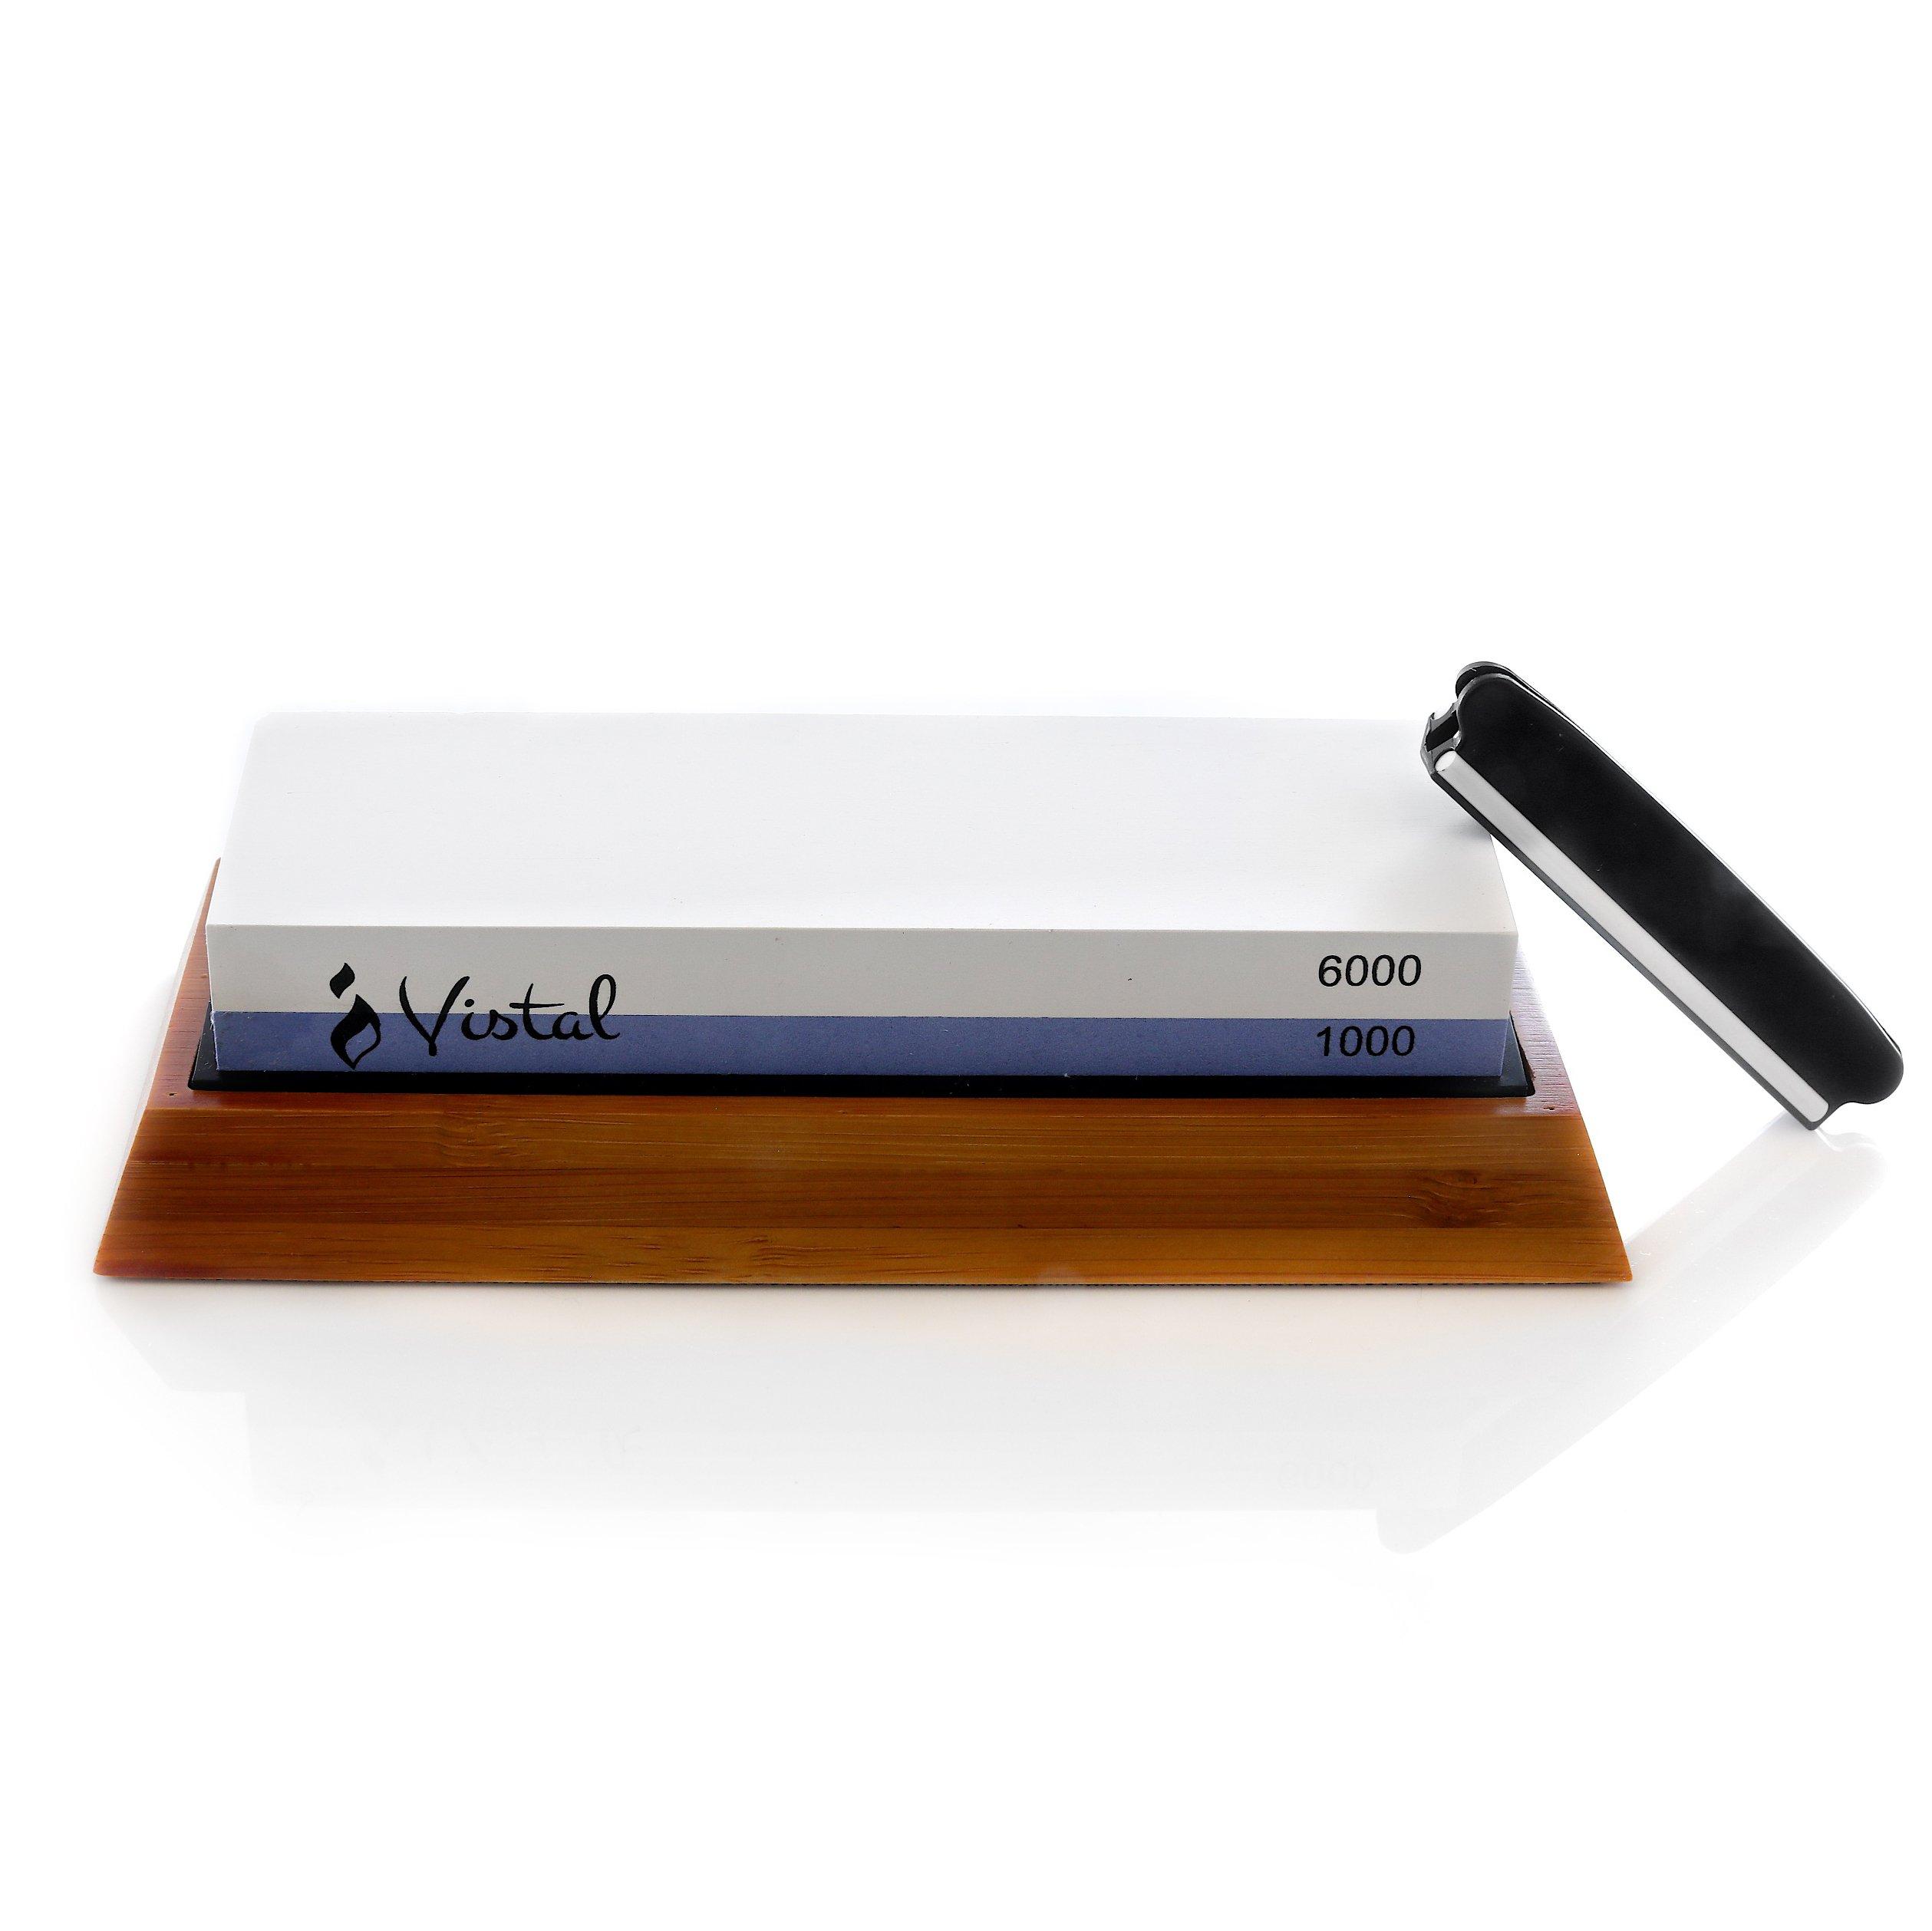 Vistal Kitchen Knife Sharpening Stone - 2 Sided Whetstone,1000/6000 Grit Knife Sharpening Stones | Chef Sharpening Stone | Wetstone, Non-Slip Base & Angle Guide Included